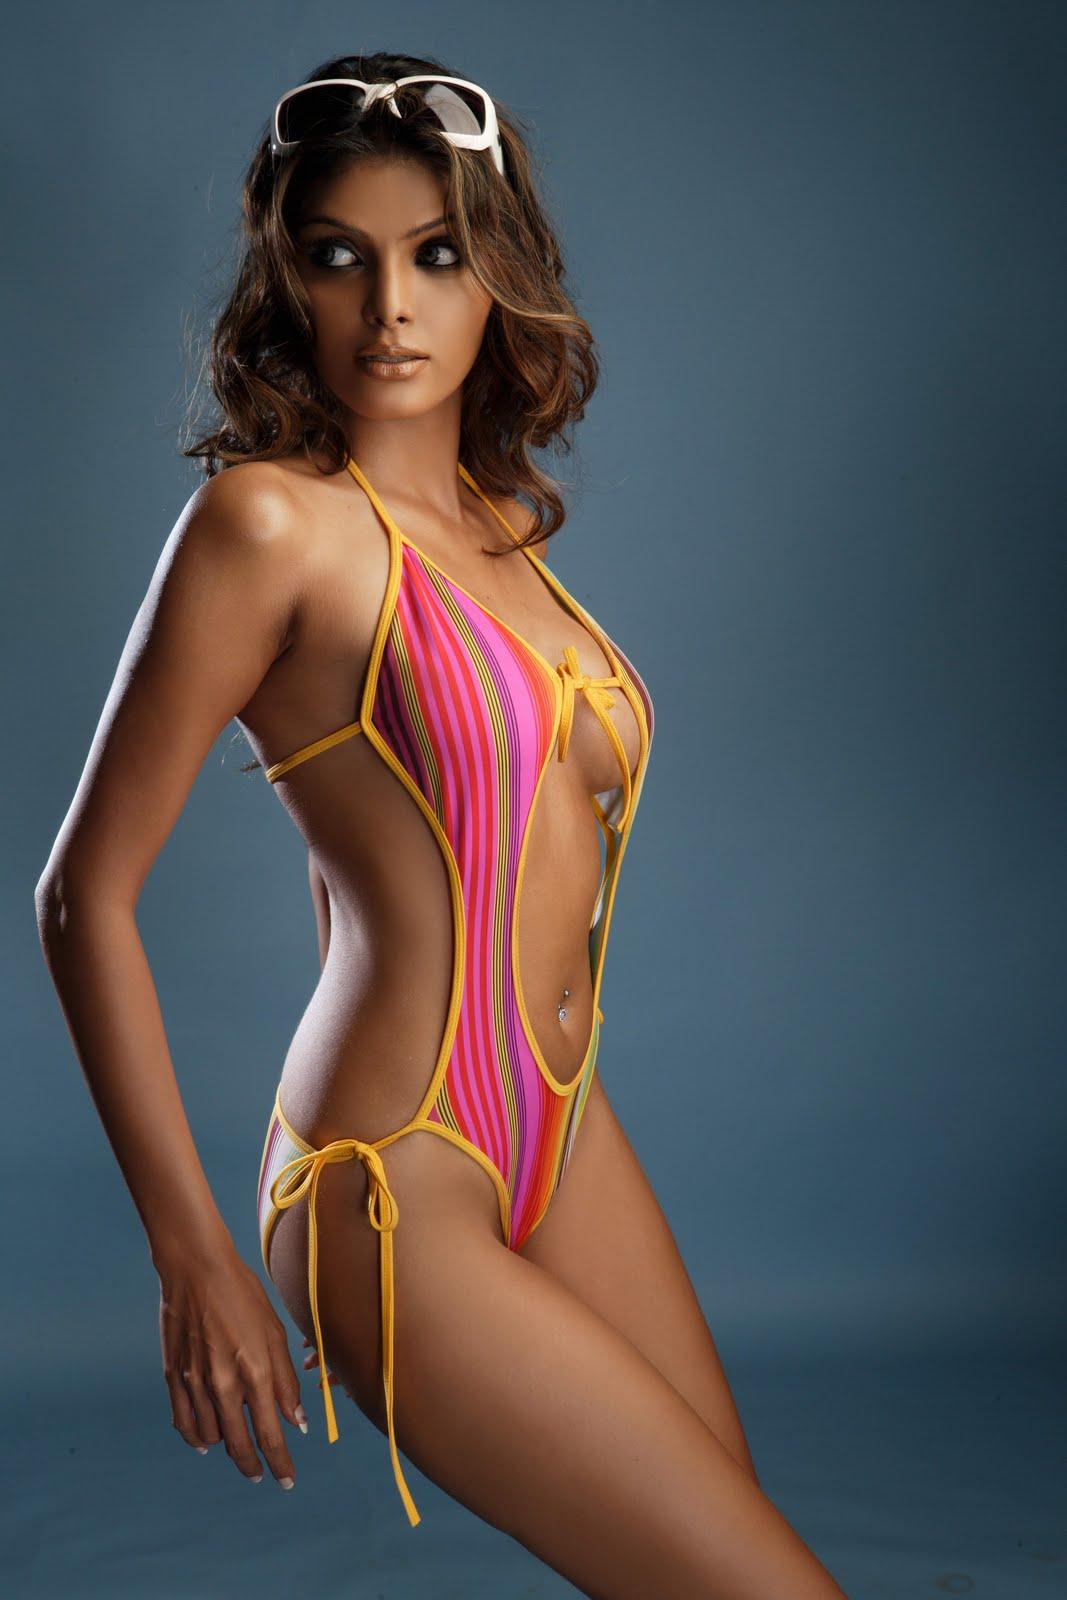 http://3.bp.blogspot.com/_BRoF0Cfublo/SwI--NPOjZI/AAAAAAAABWA/6Mn2ioT5ZOE/s1600/Sherlyn_Bikini.jpg+23.jpg